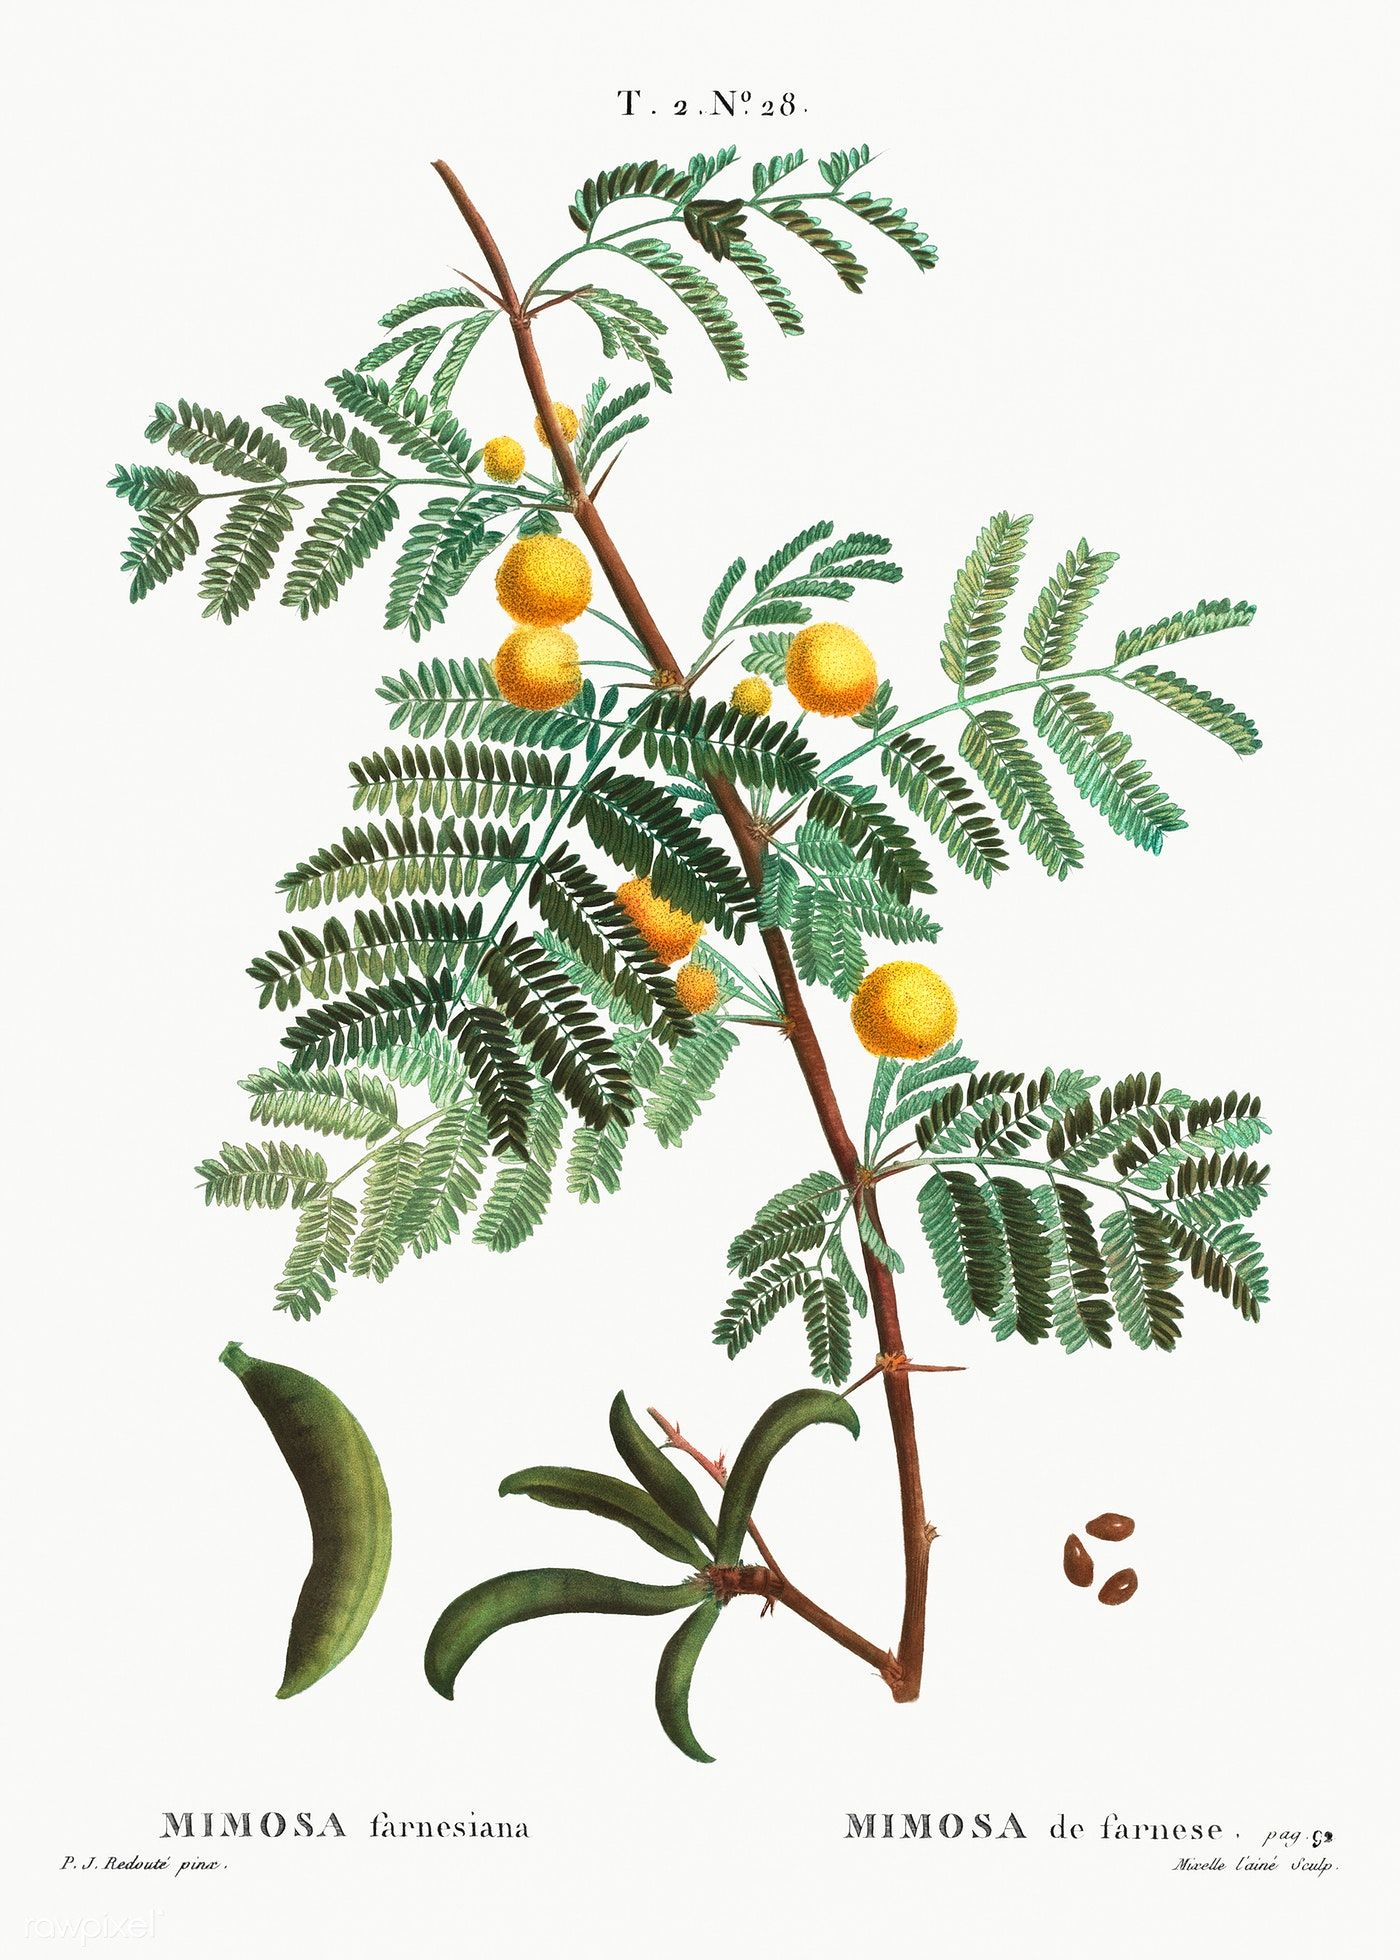 Sweet Acacia Mimosa Farnesiana From Trait Eacute Des Arbres Et Arbustes Que L Rsquo On Cultive En France En Pleine Te In 2020 Acacia Myrtle Flower Botanical Artwork